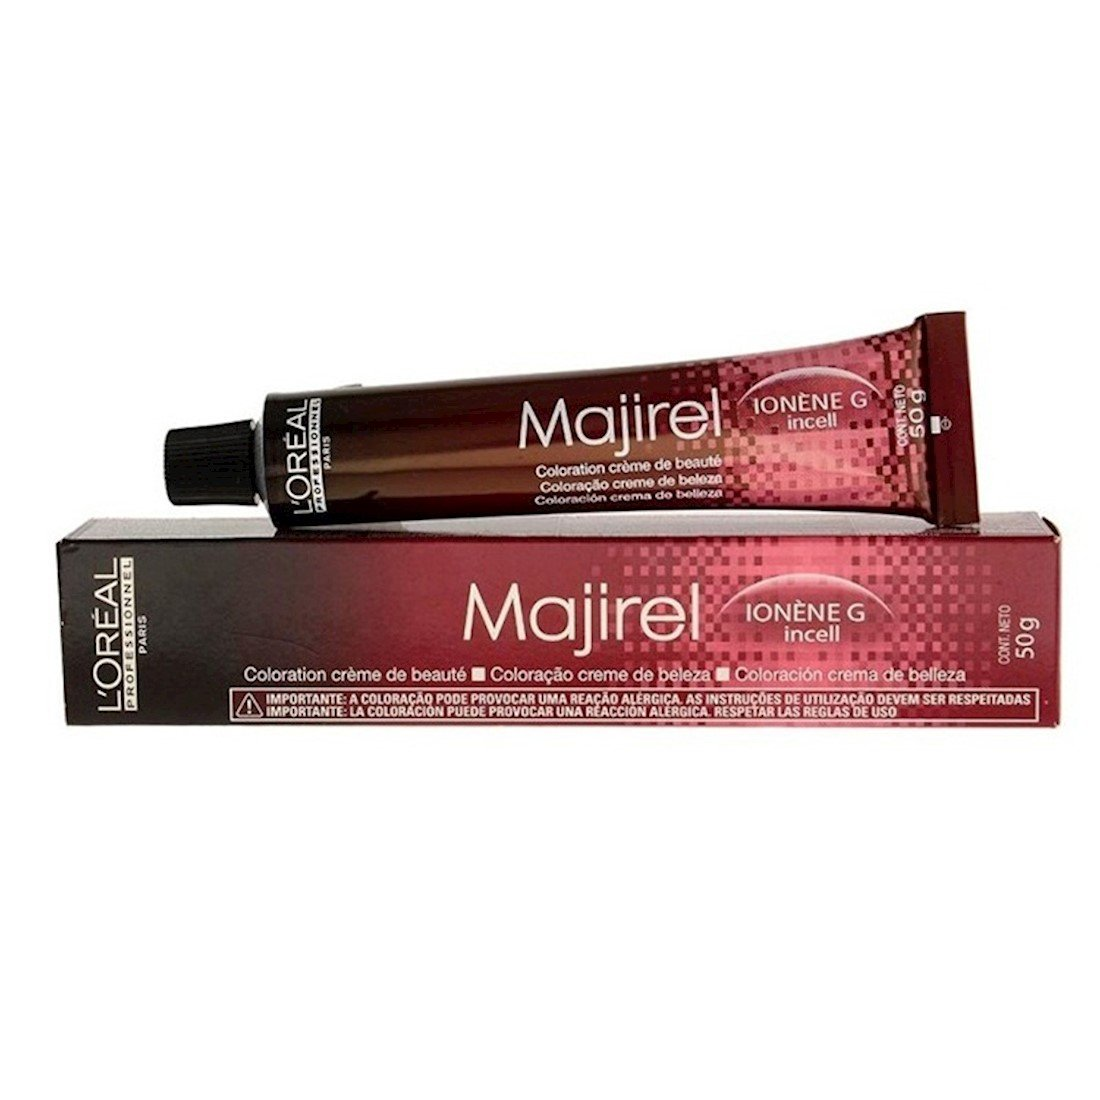 Coloração Majirel 5 (Castanho claro) da L'Oreal 50g Bisnaga